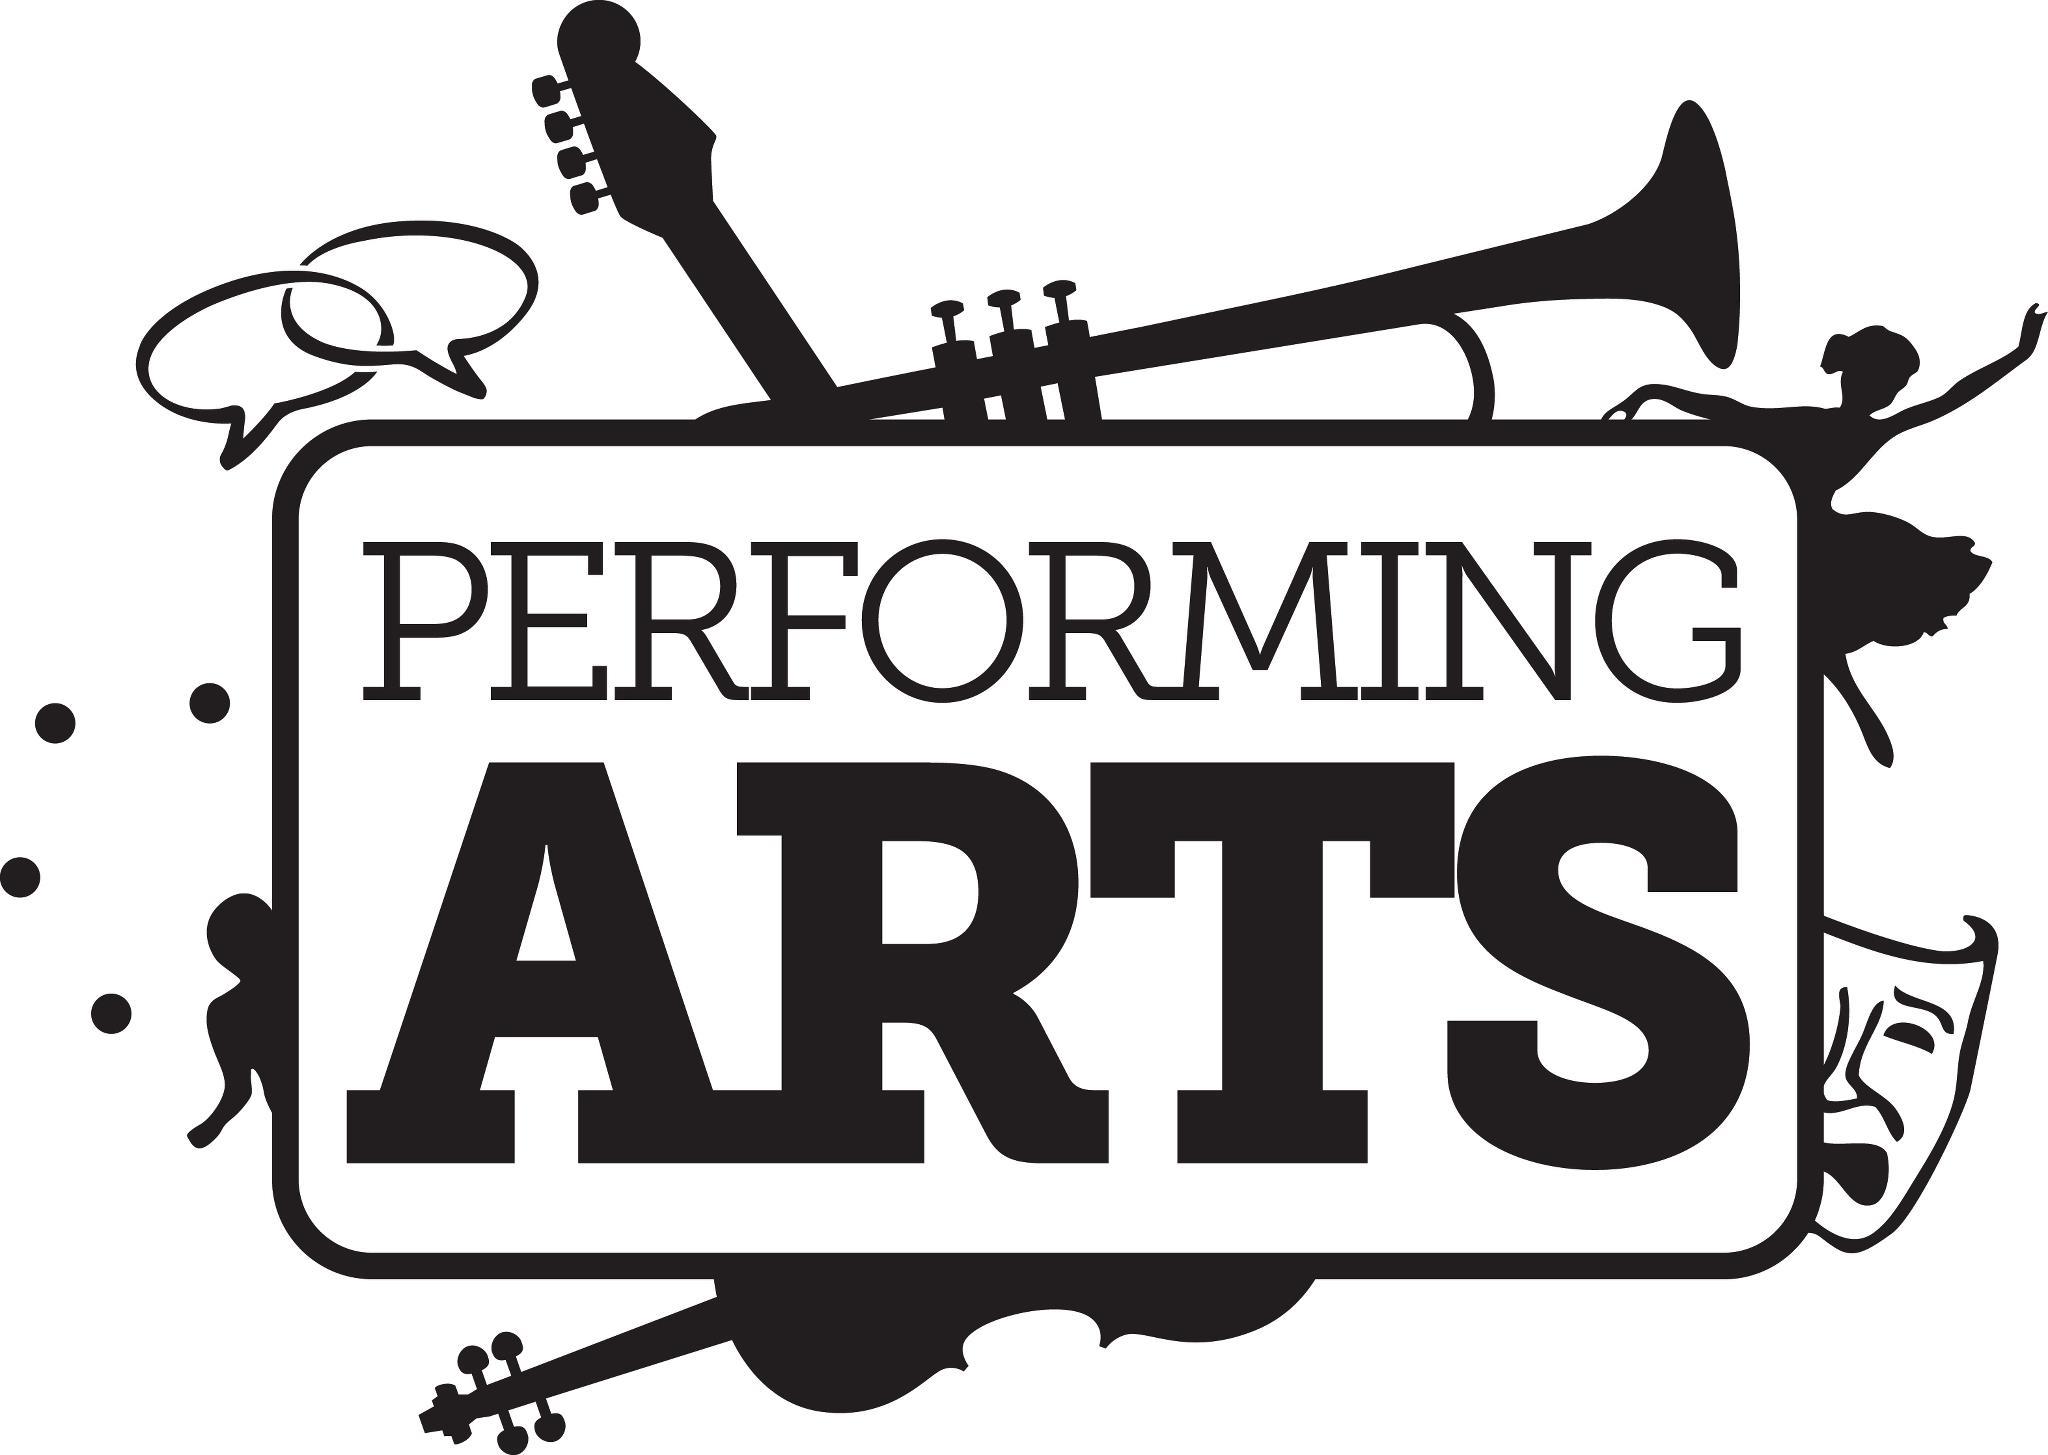 Performing arts clipart.